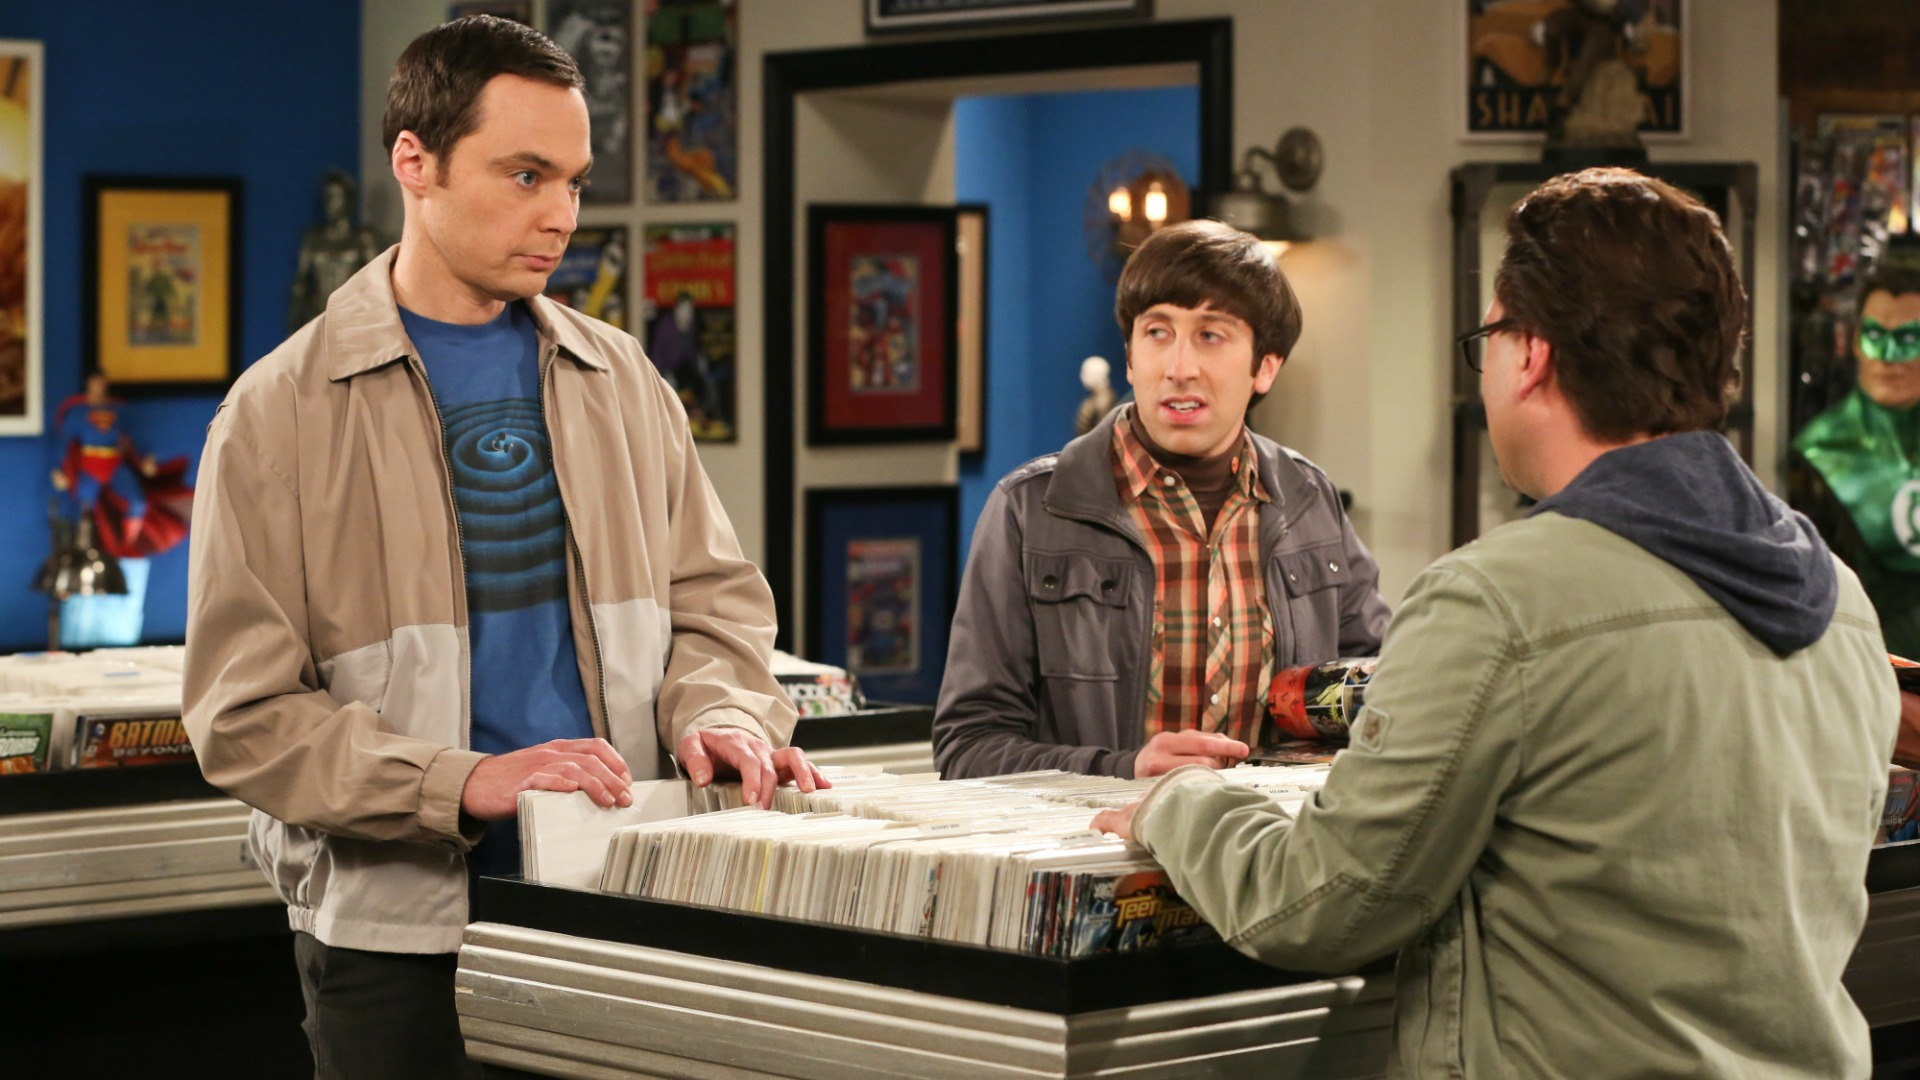 Something surprises Sheldon while sorting through the comics.